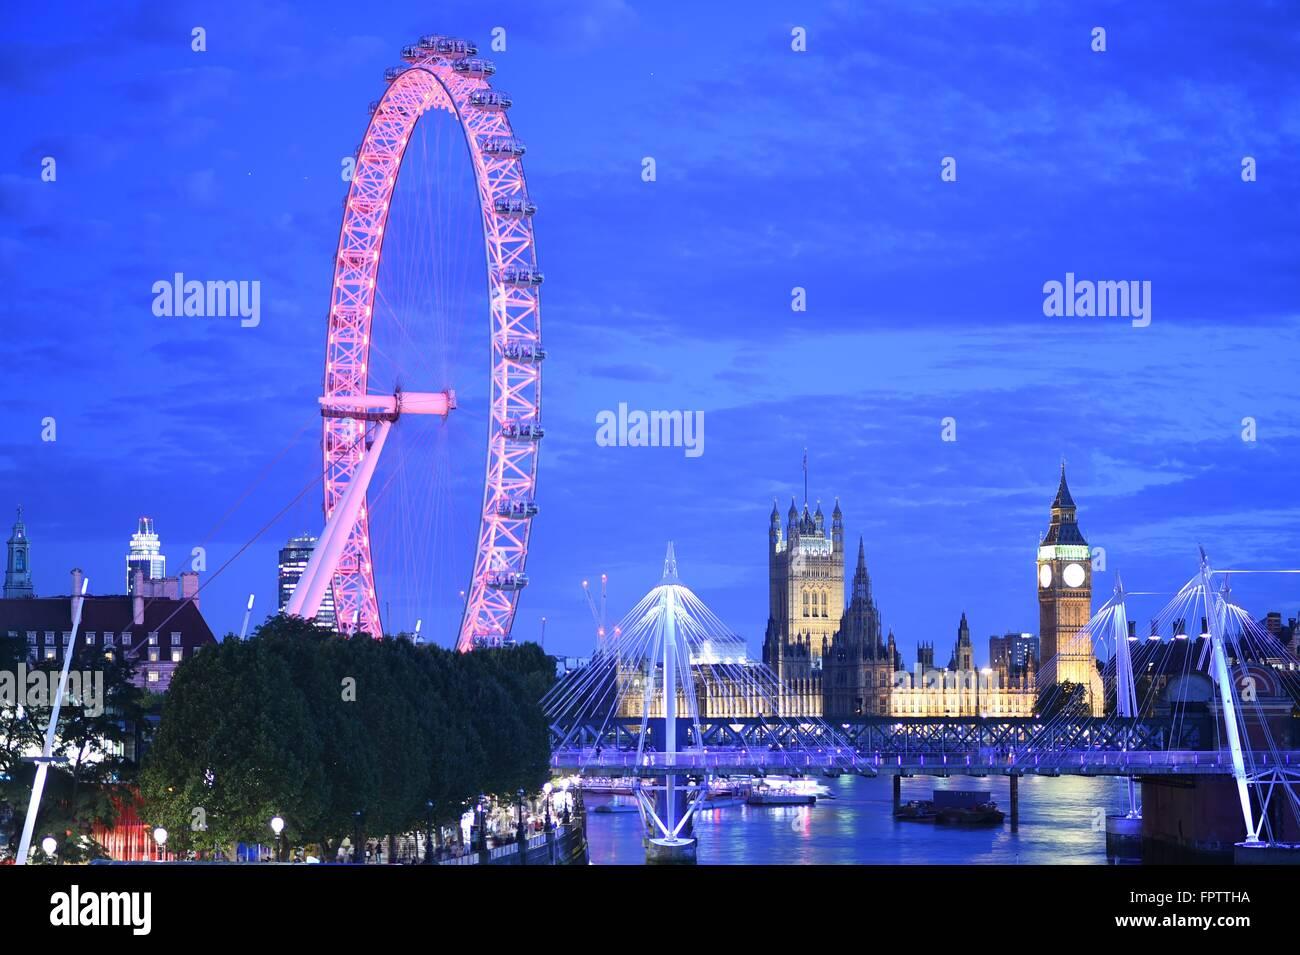 London Eye, 360 degree views of london - Stock Image